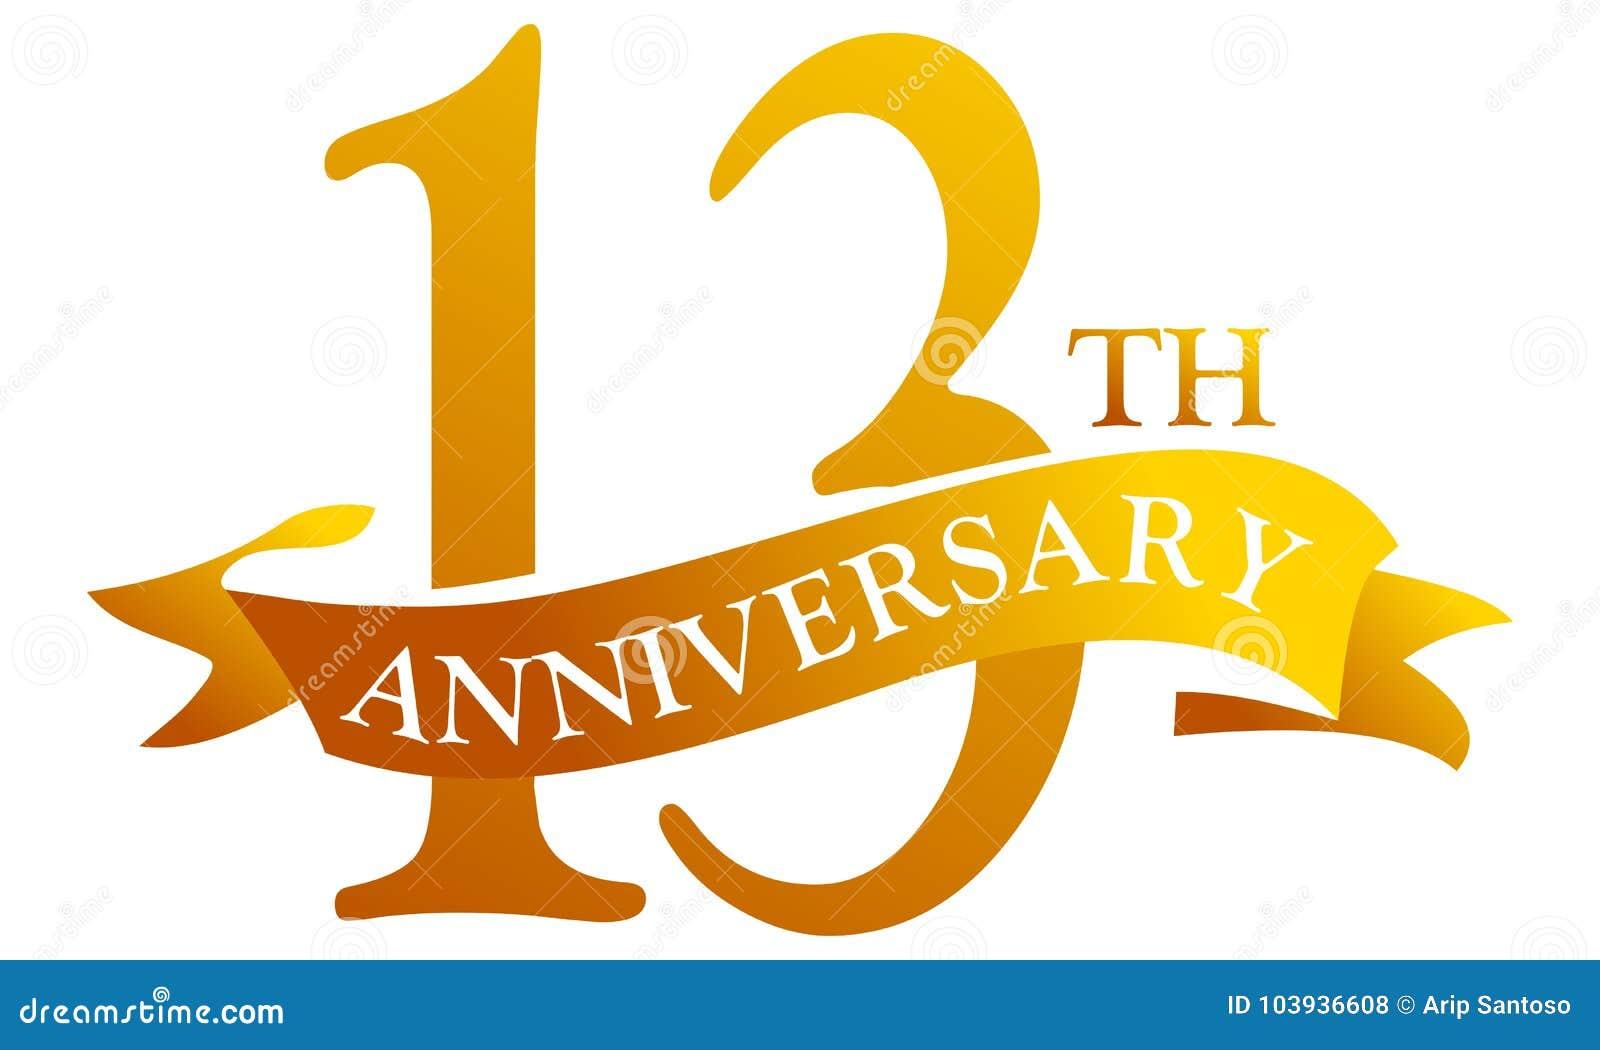 13 year ribbon anniversary stock vector illustration of isolated